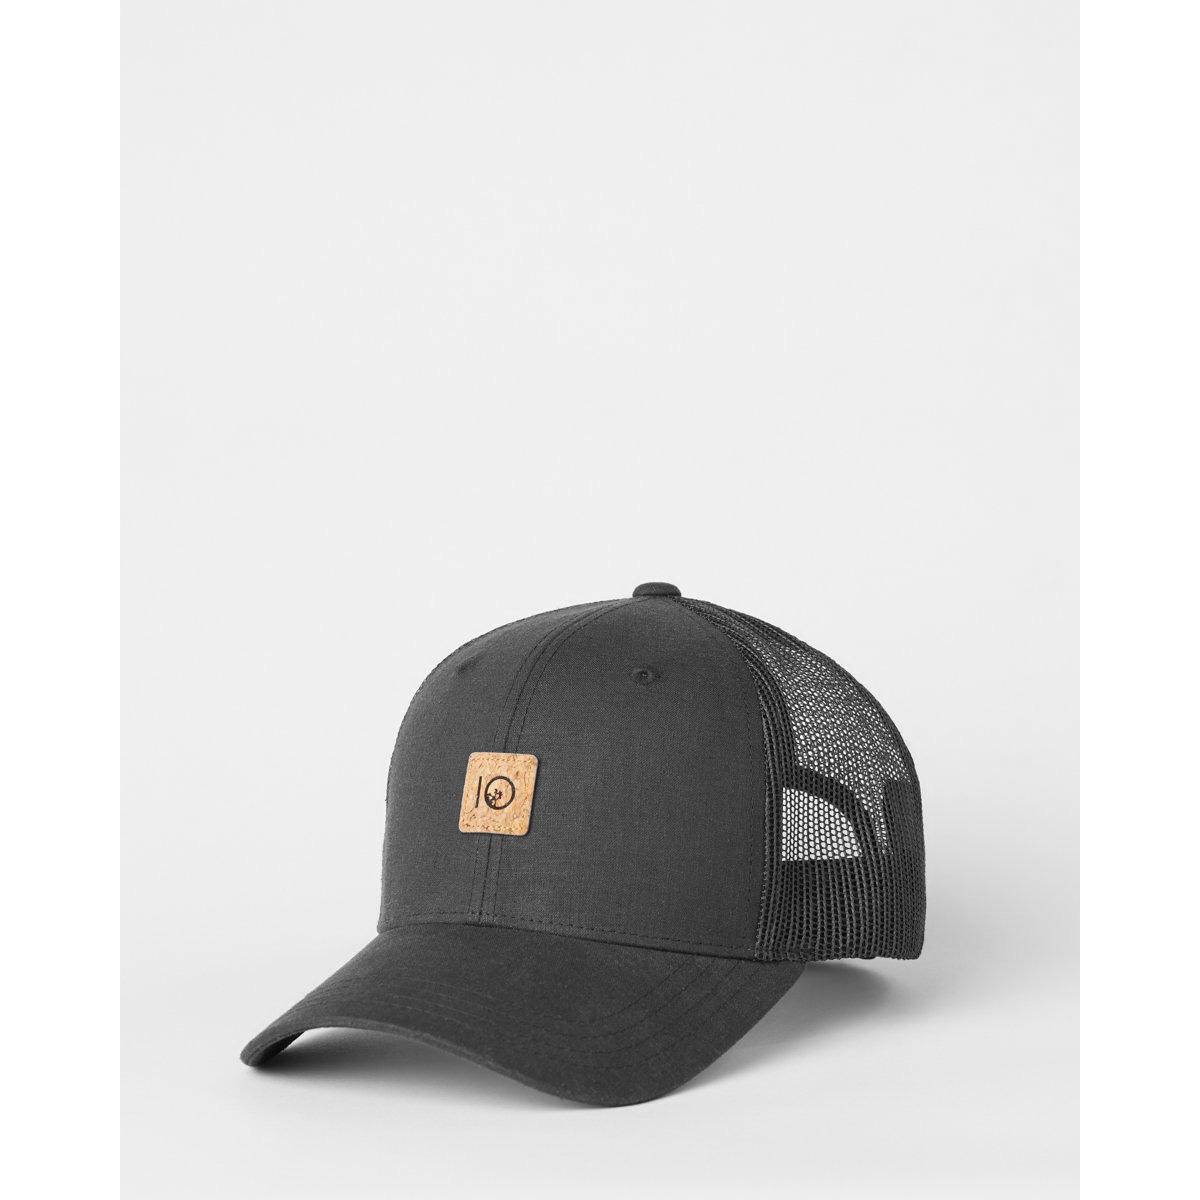 Elevation Ball Cap